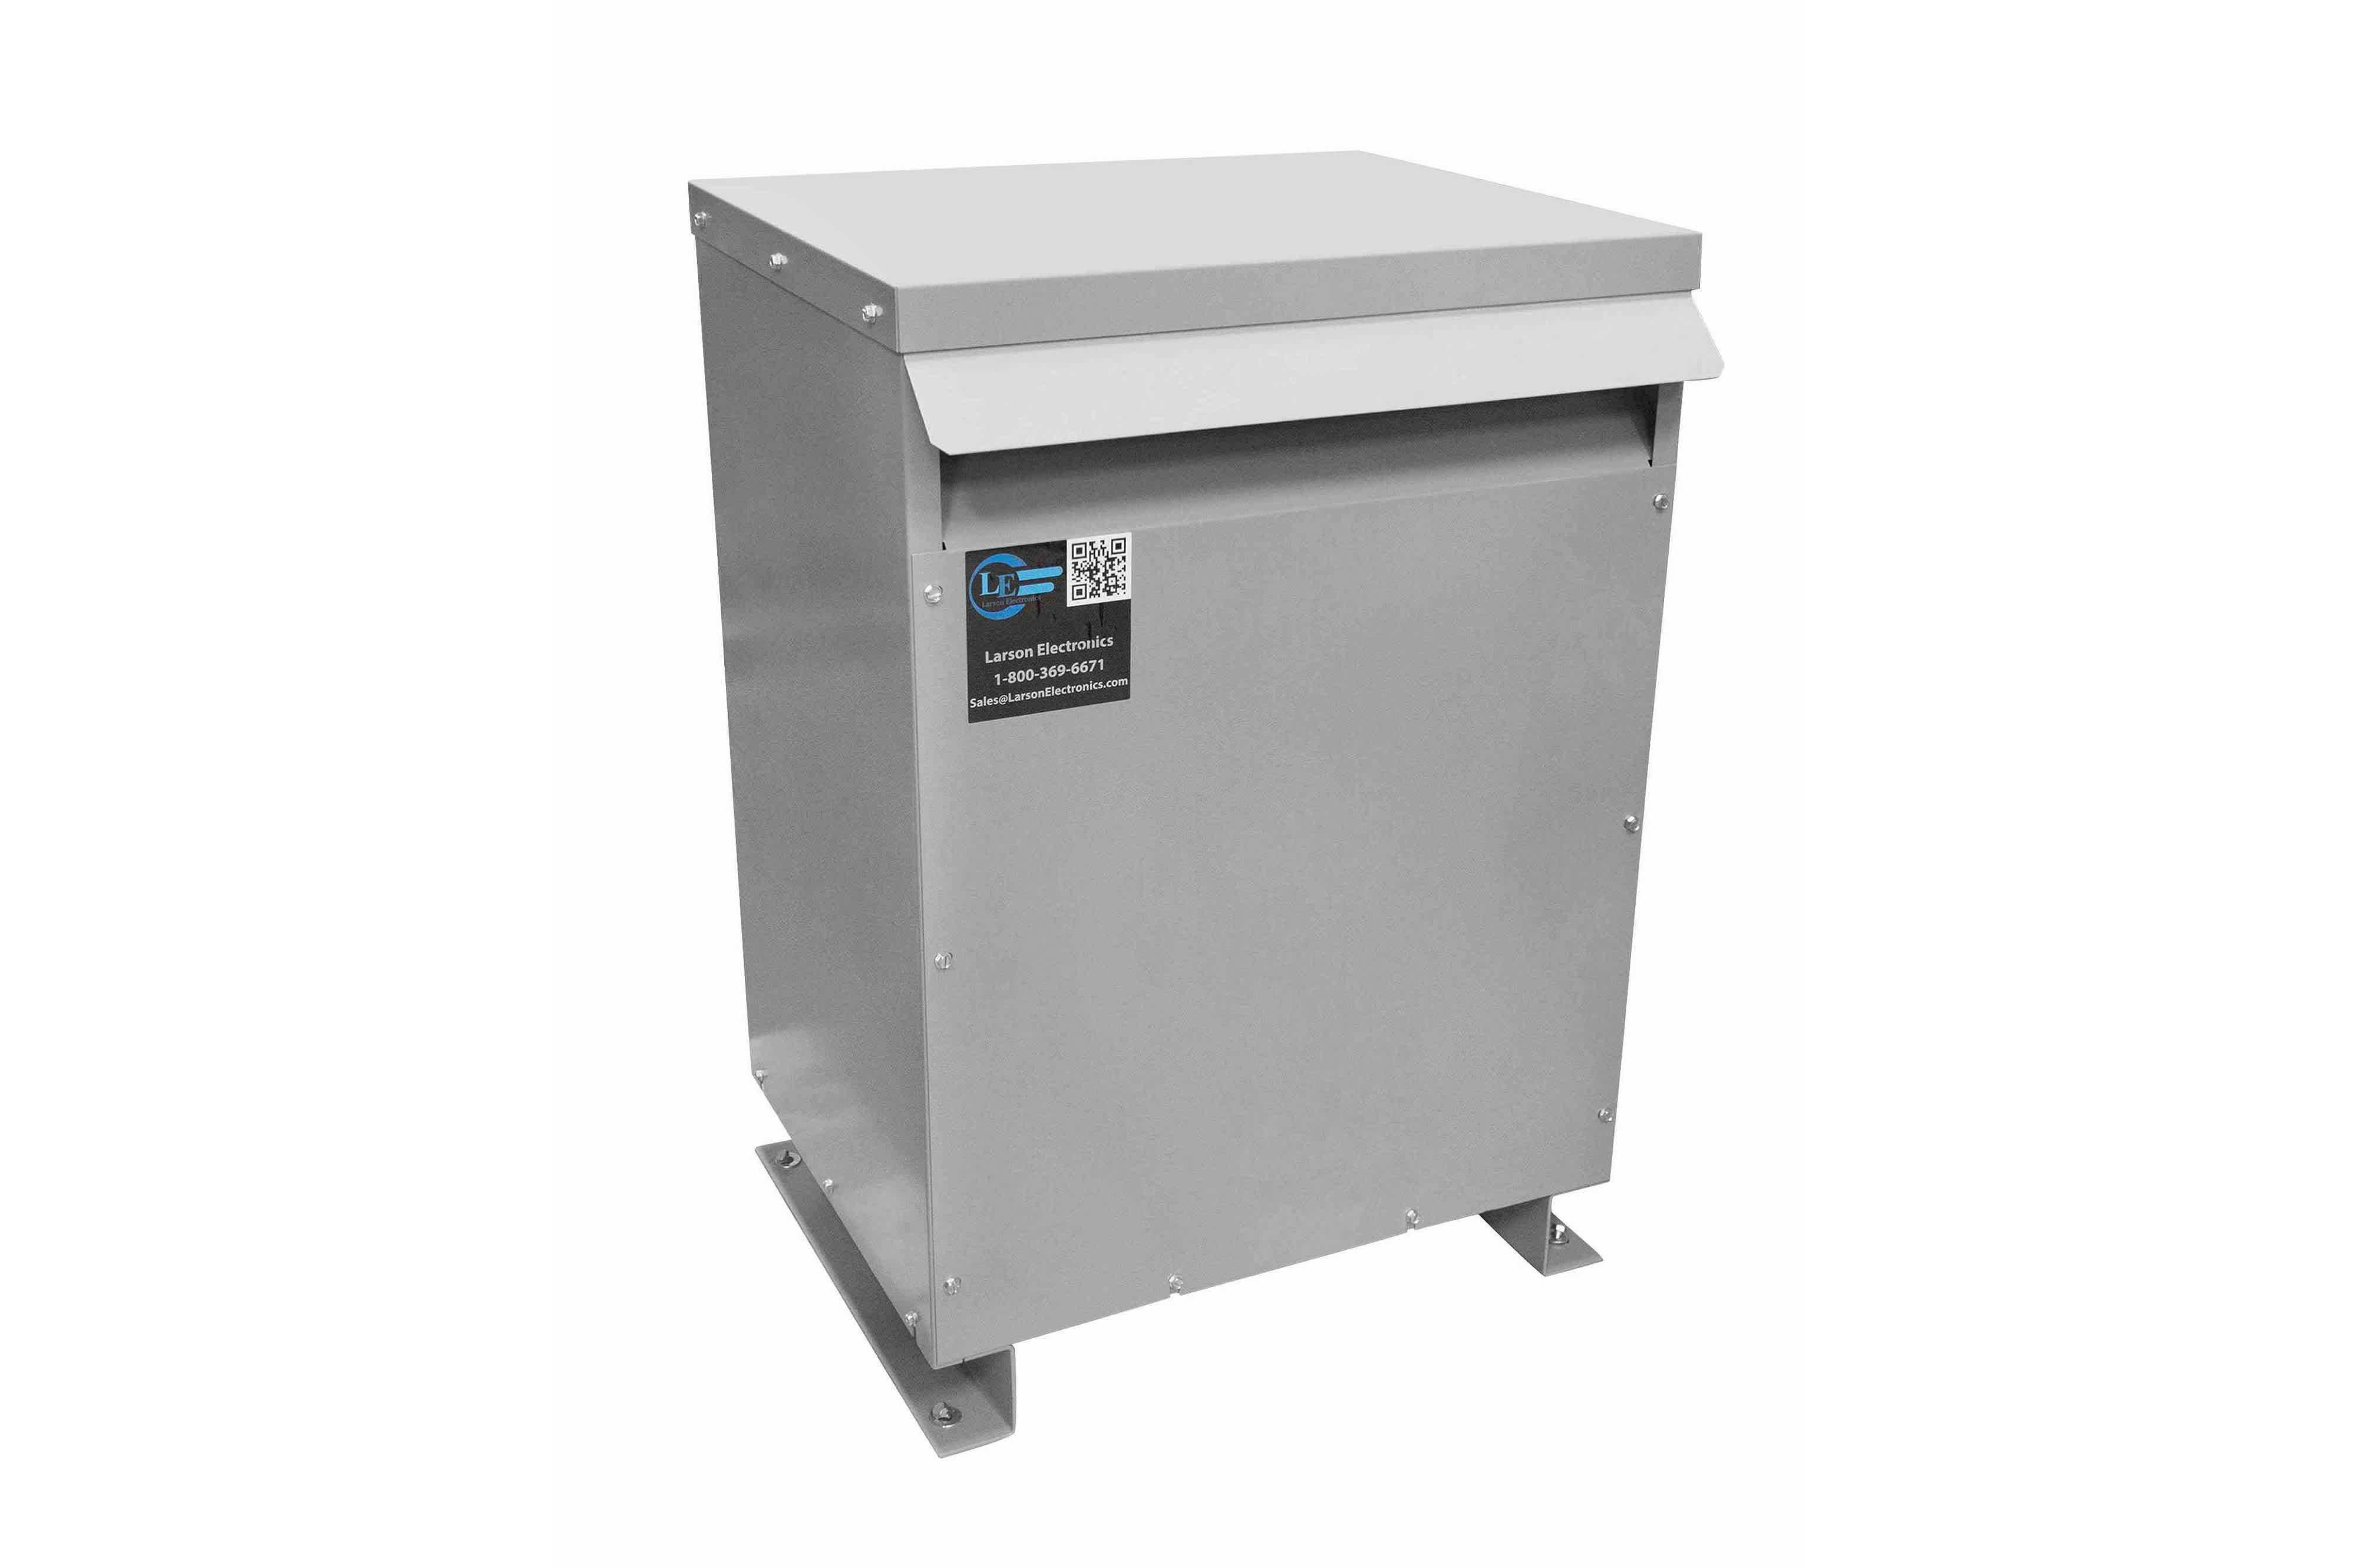 37.5 kVA 3PH Isolation Transformer, 380V Wye Primary, 600Y/347 Wye-N Secondary, N3R, Ventilated, 60 Hz